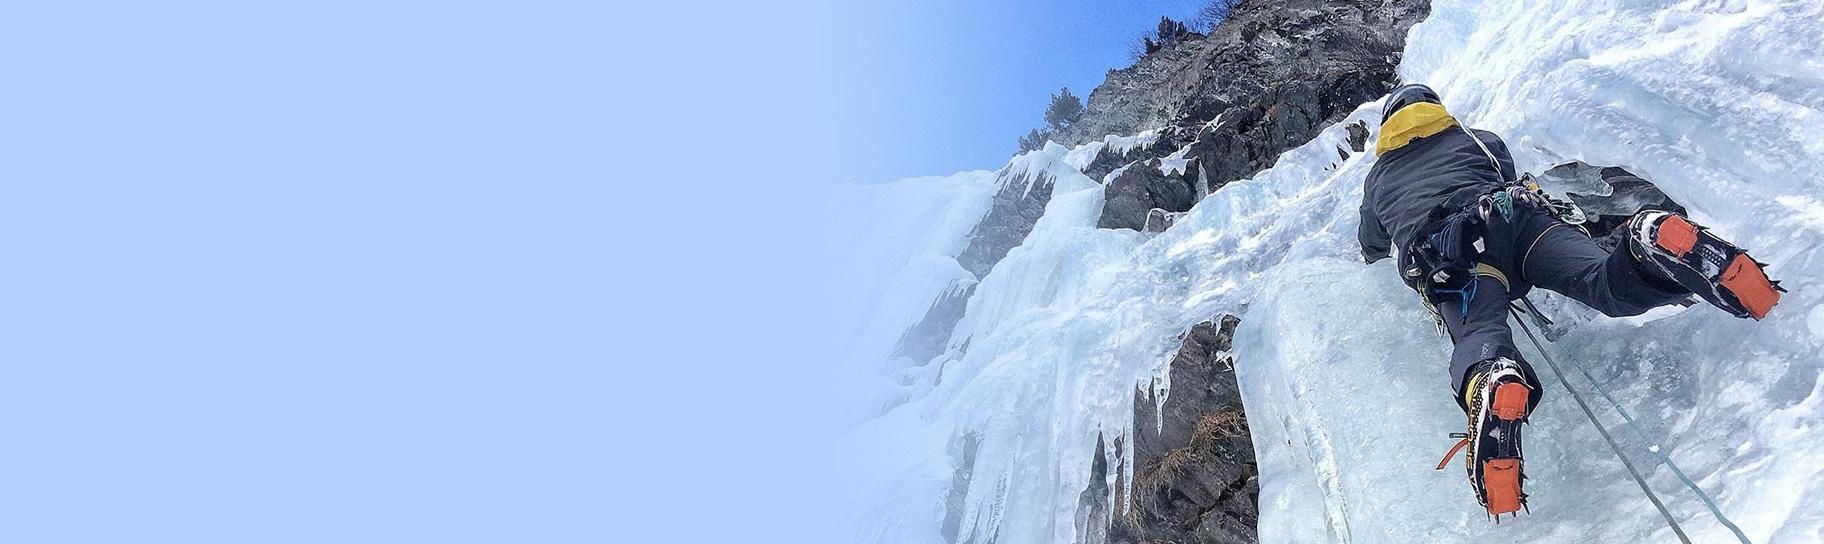 Alpinklettern